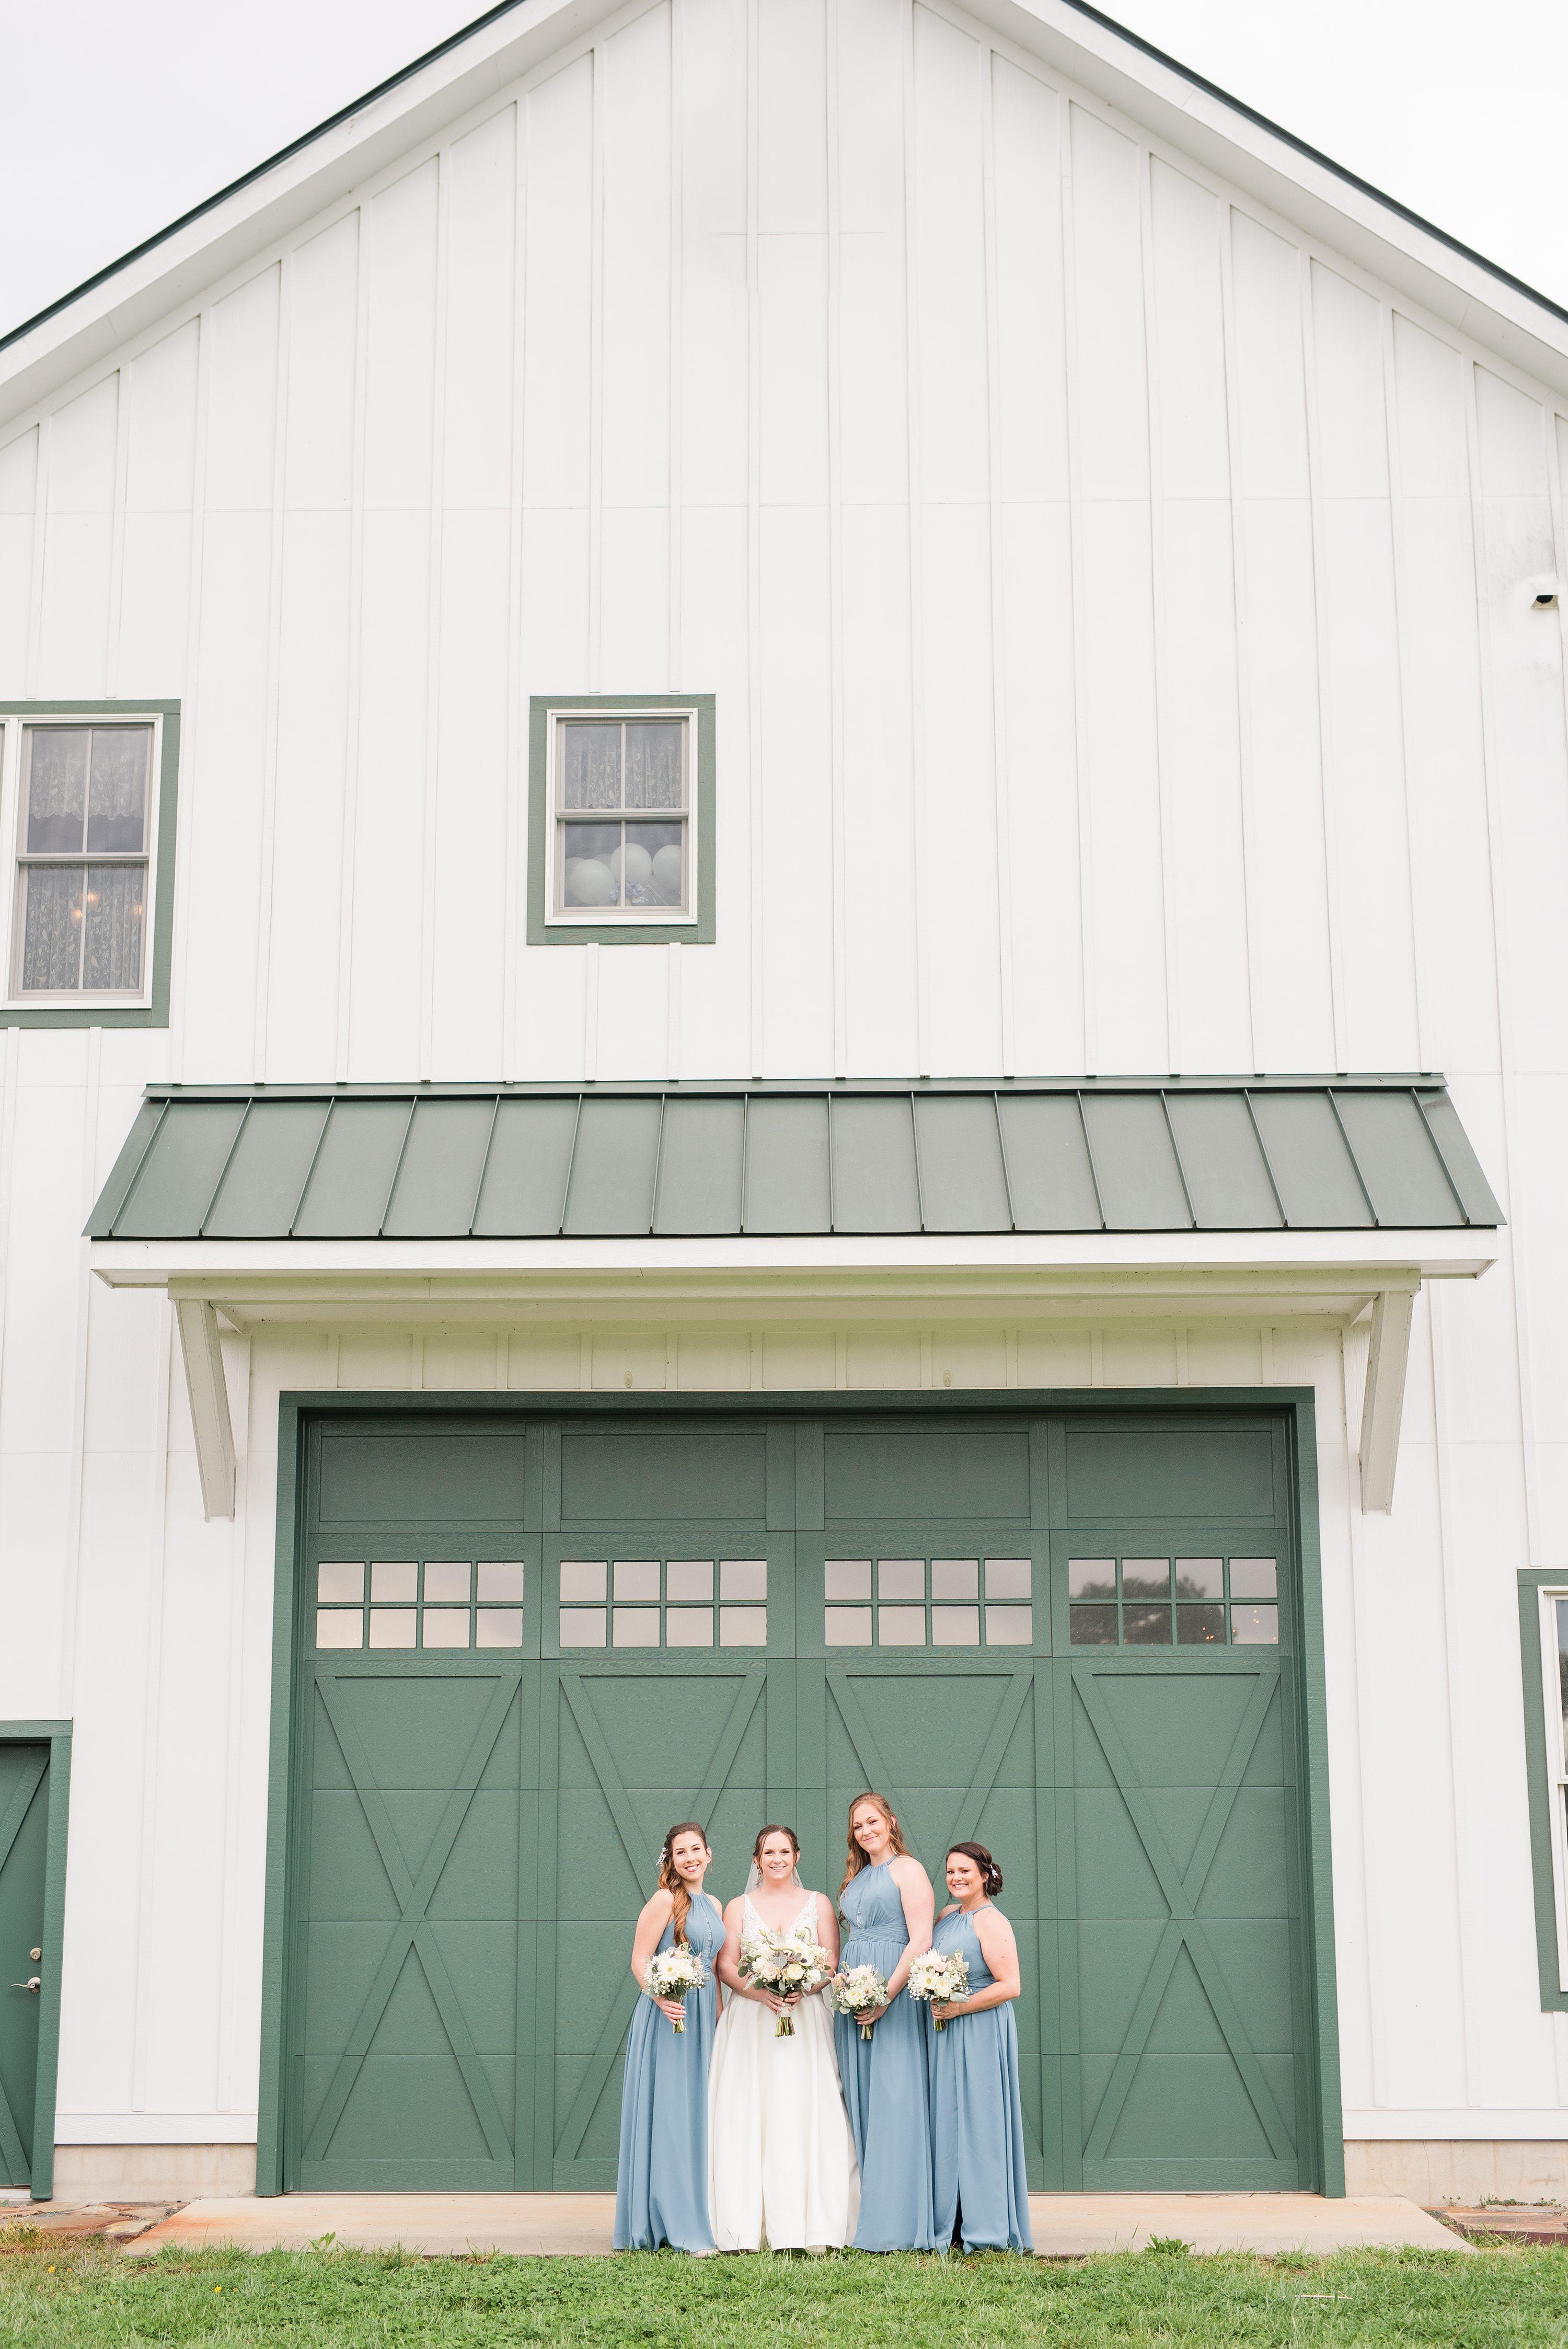 Spring,Spring Wedding,Barn at Edgewood,bride and bridesmaids,bridesmaids,bride